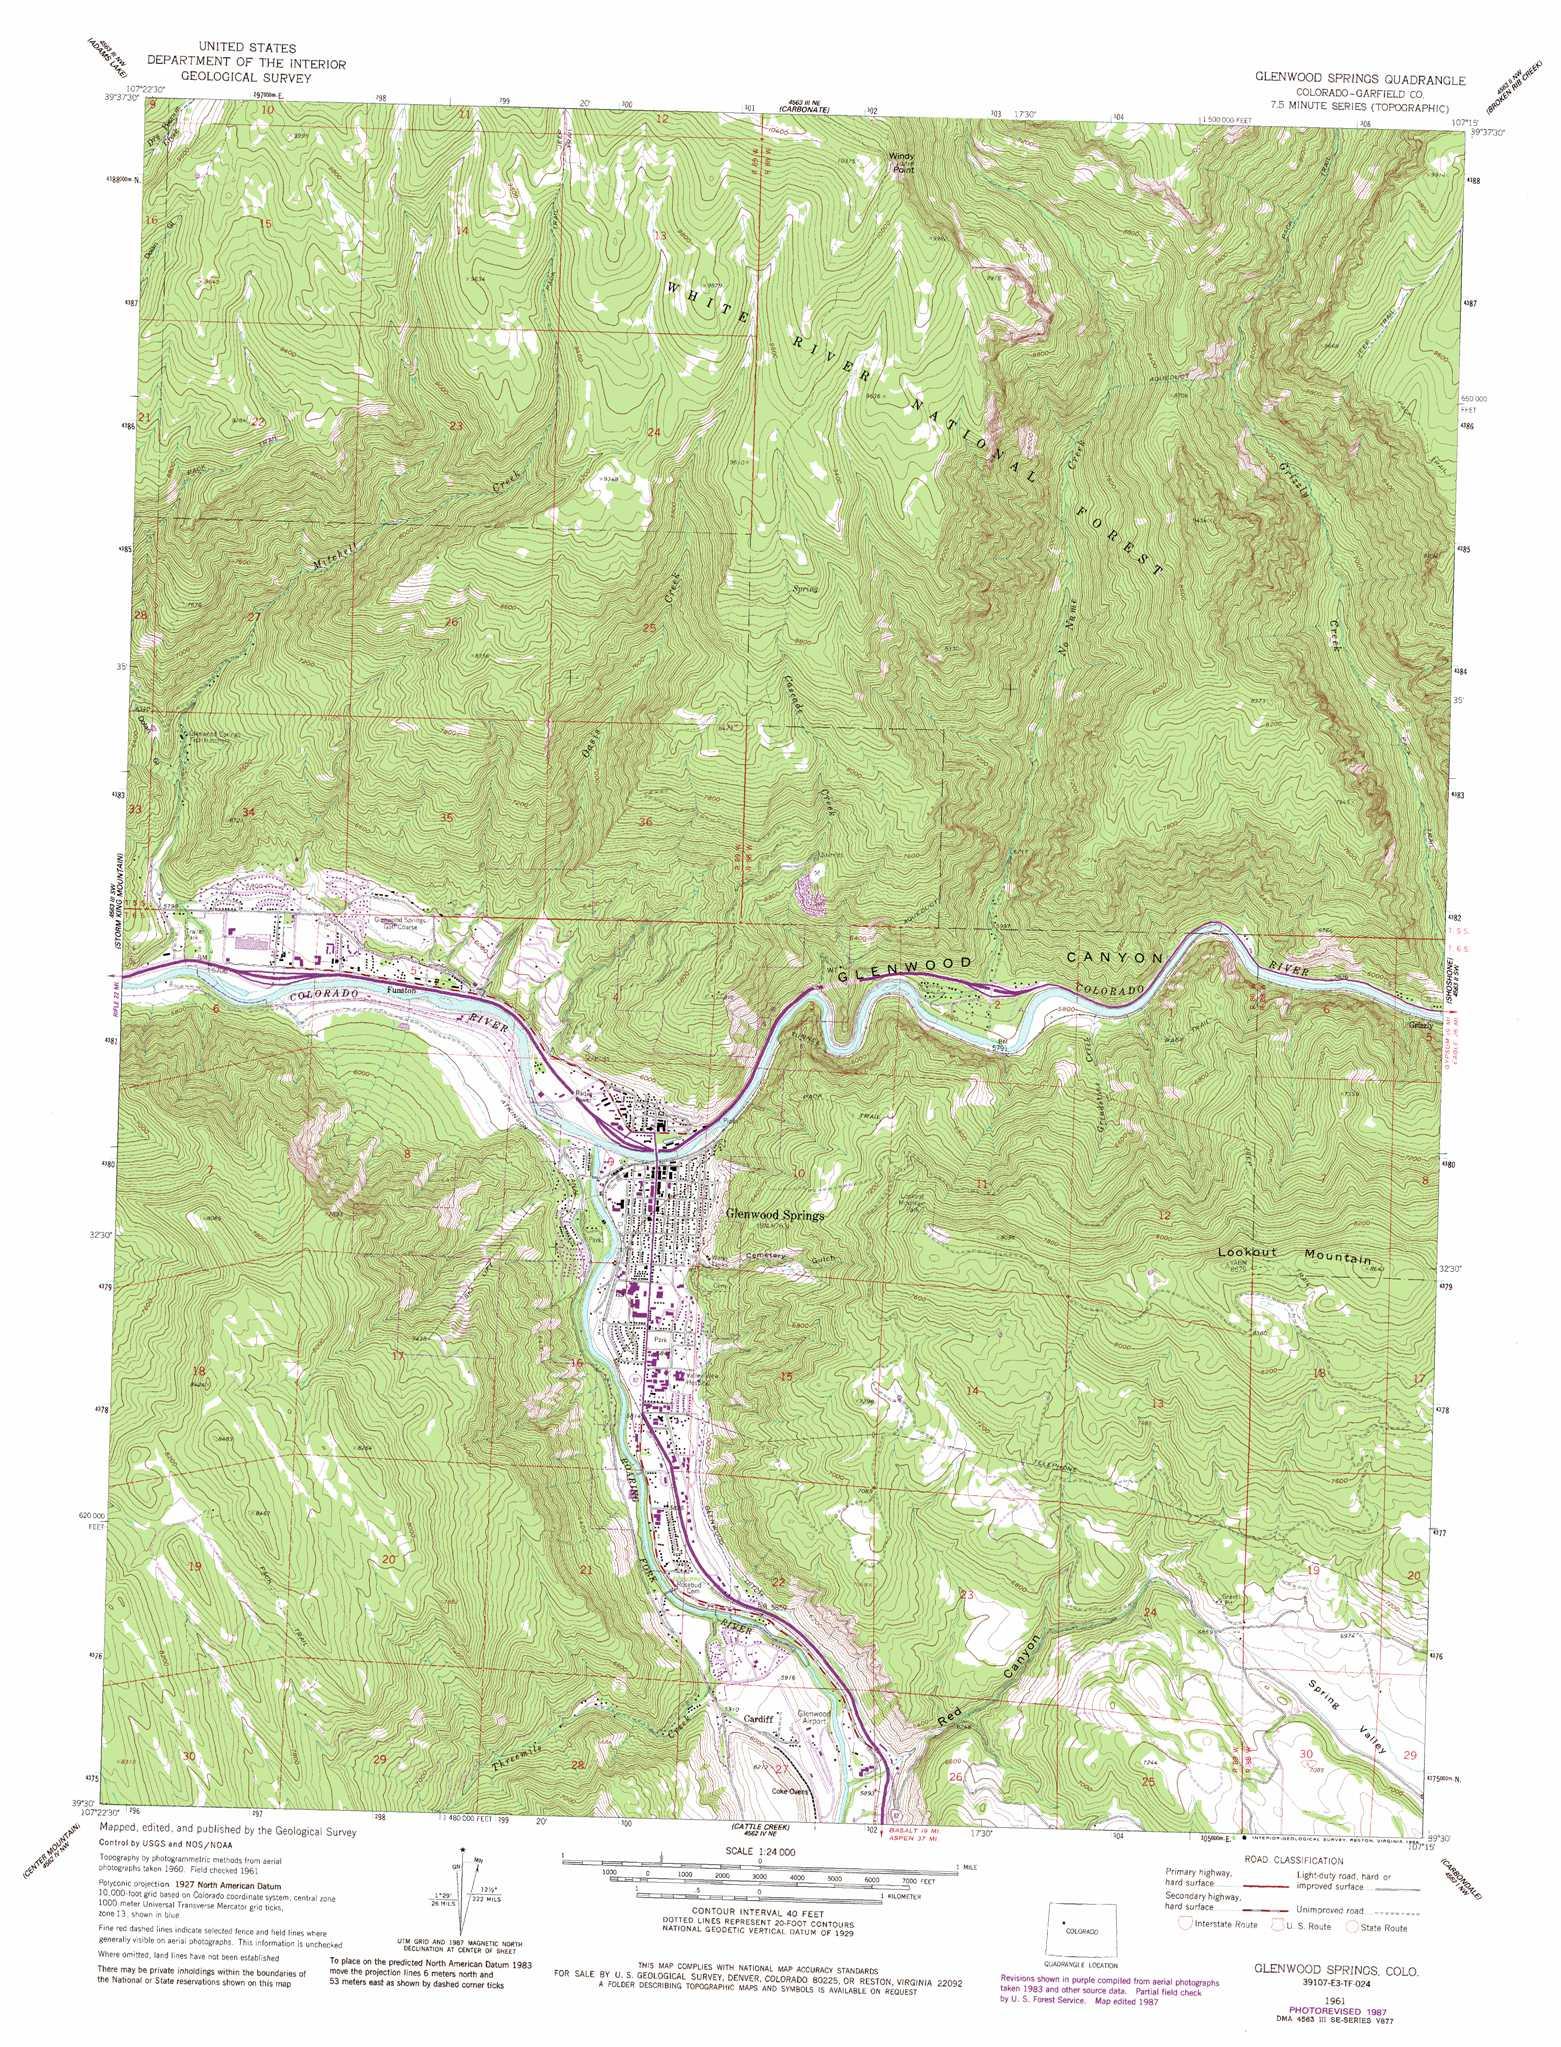 Glenwood Springs topographic map, CO - USGS Topo Quad 39107e3